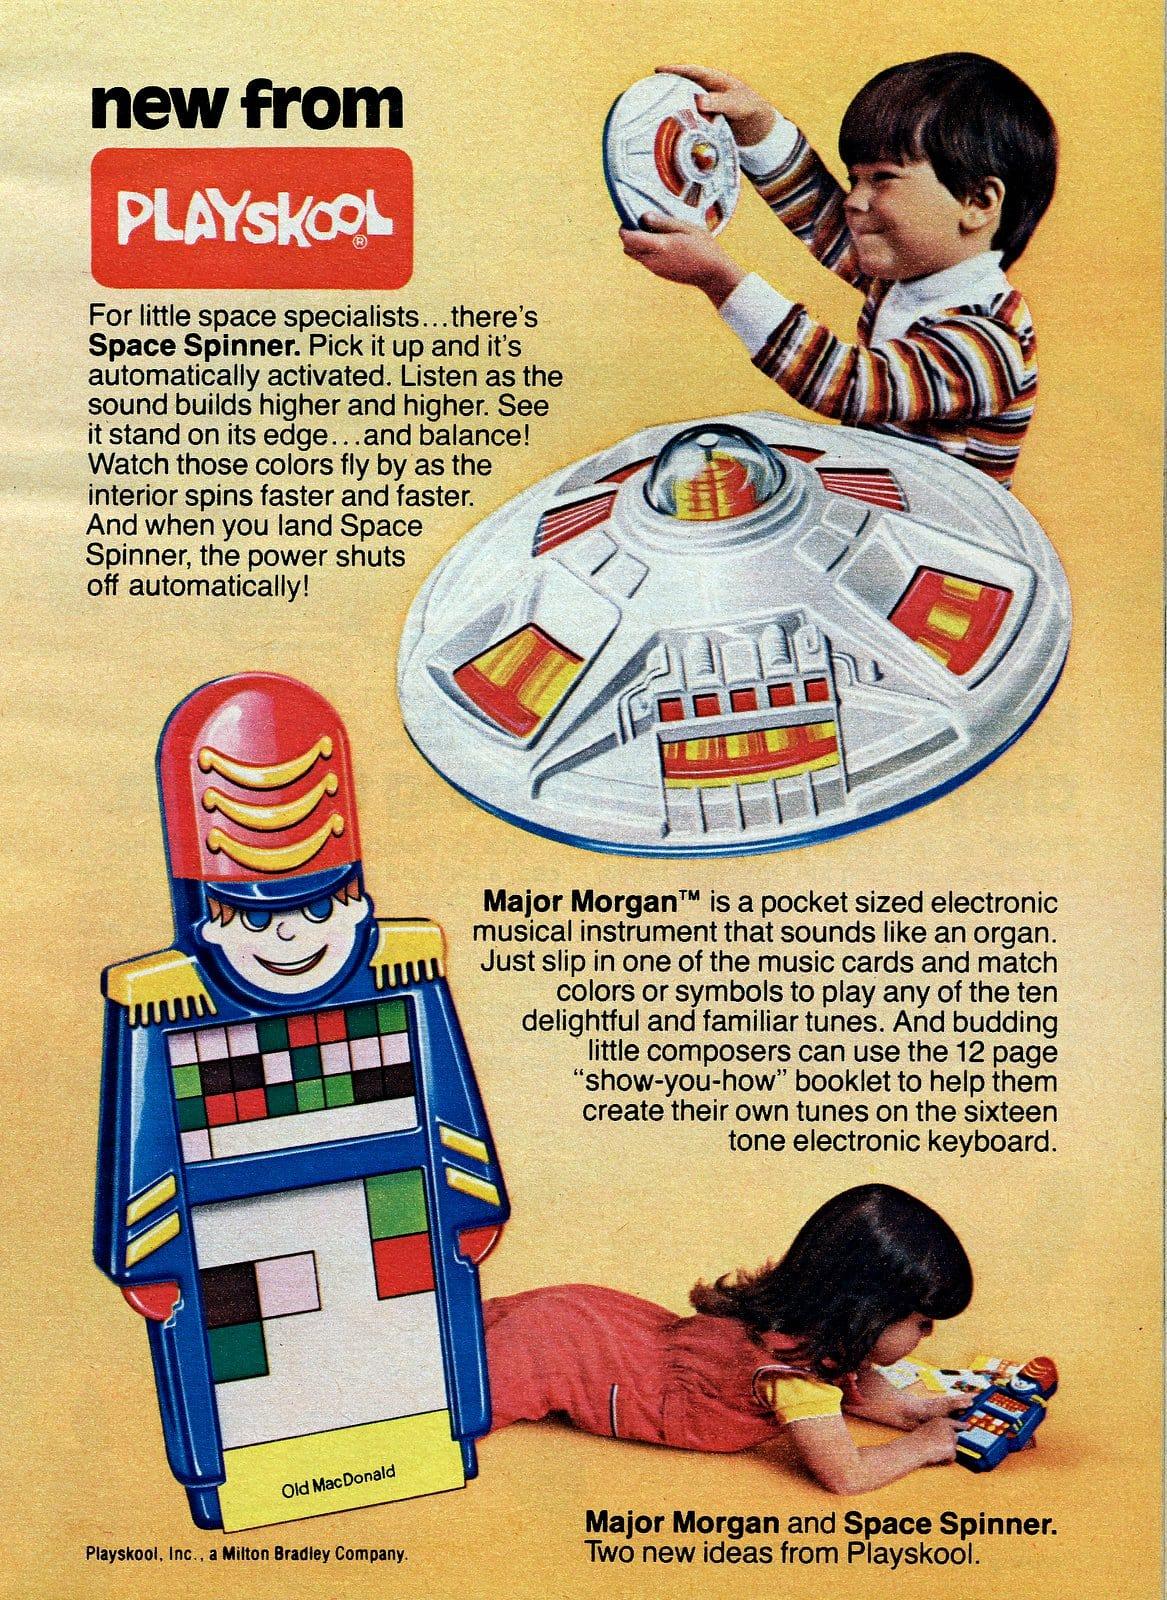 Vintage Playskool Space Spinner and Major Morgan toys (1979)